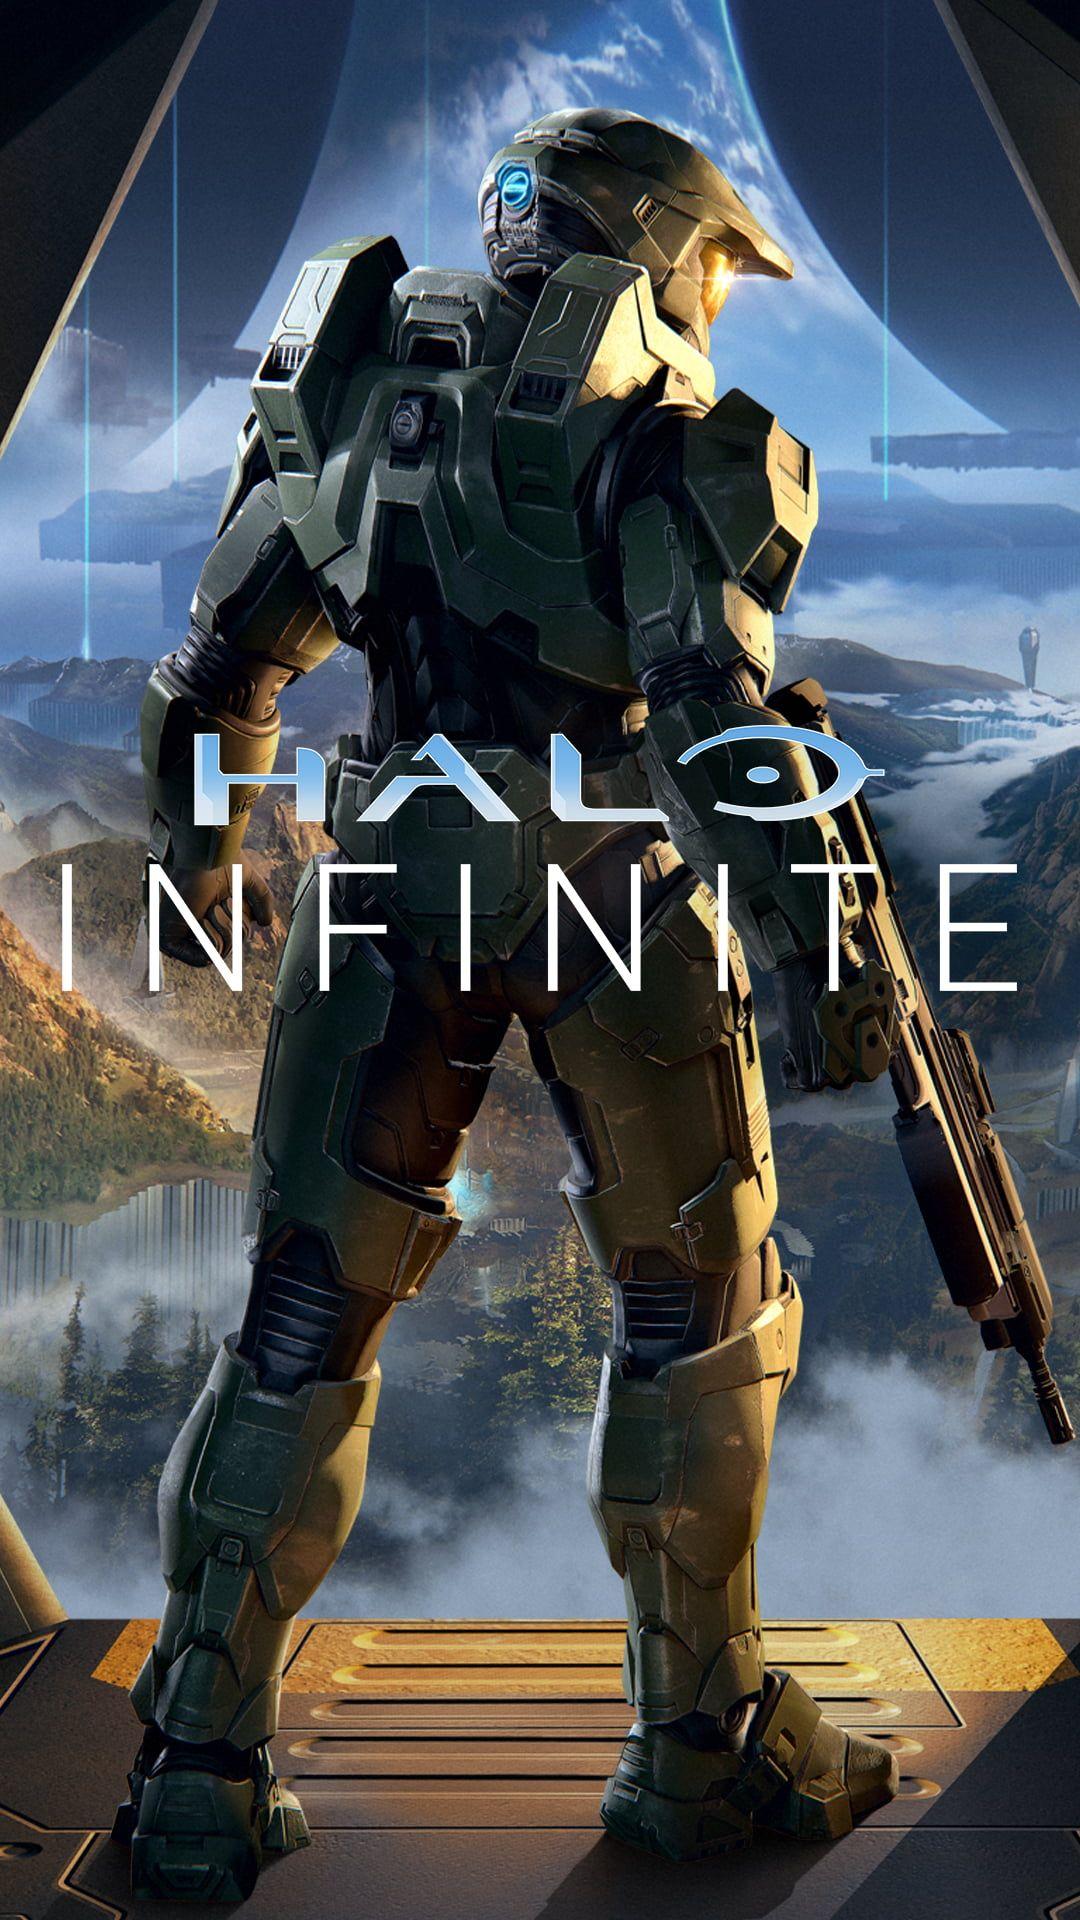 Halo Infinite Master Chief 1080p Wallpaper Hdwallpaper Desktop In 2021 Cortana Halo Halo Halo Master Chief